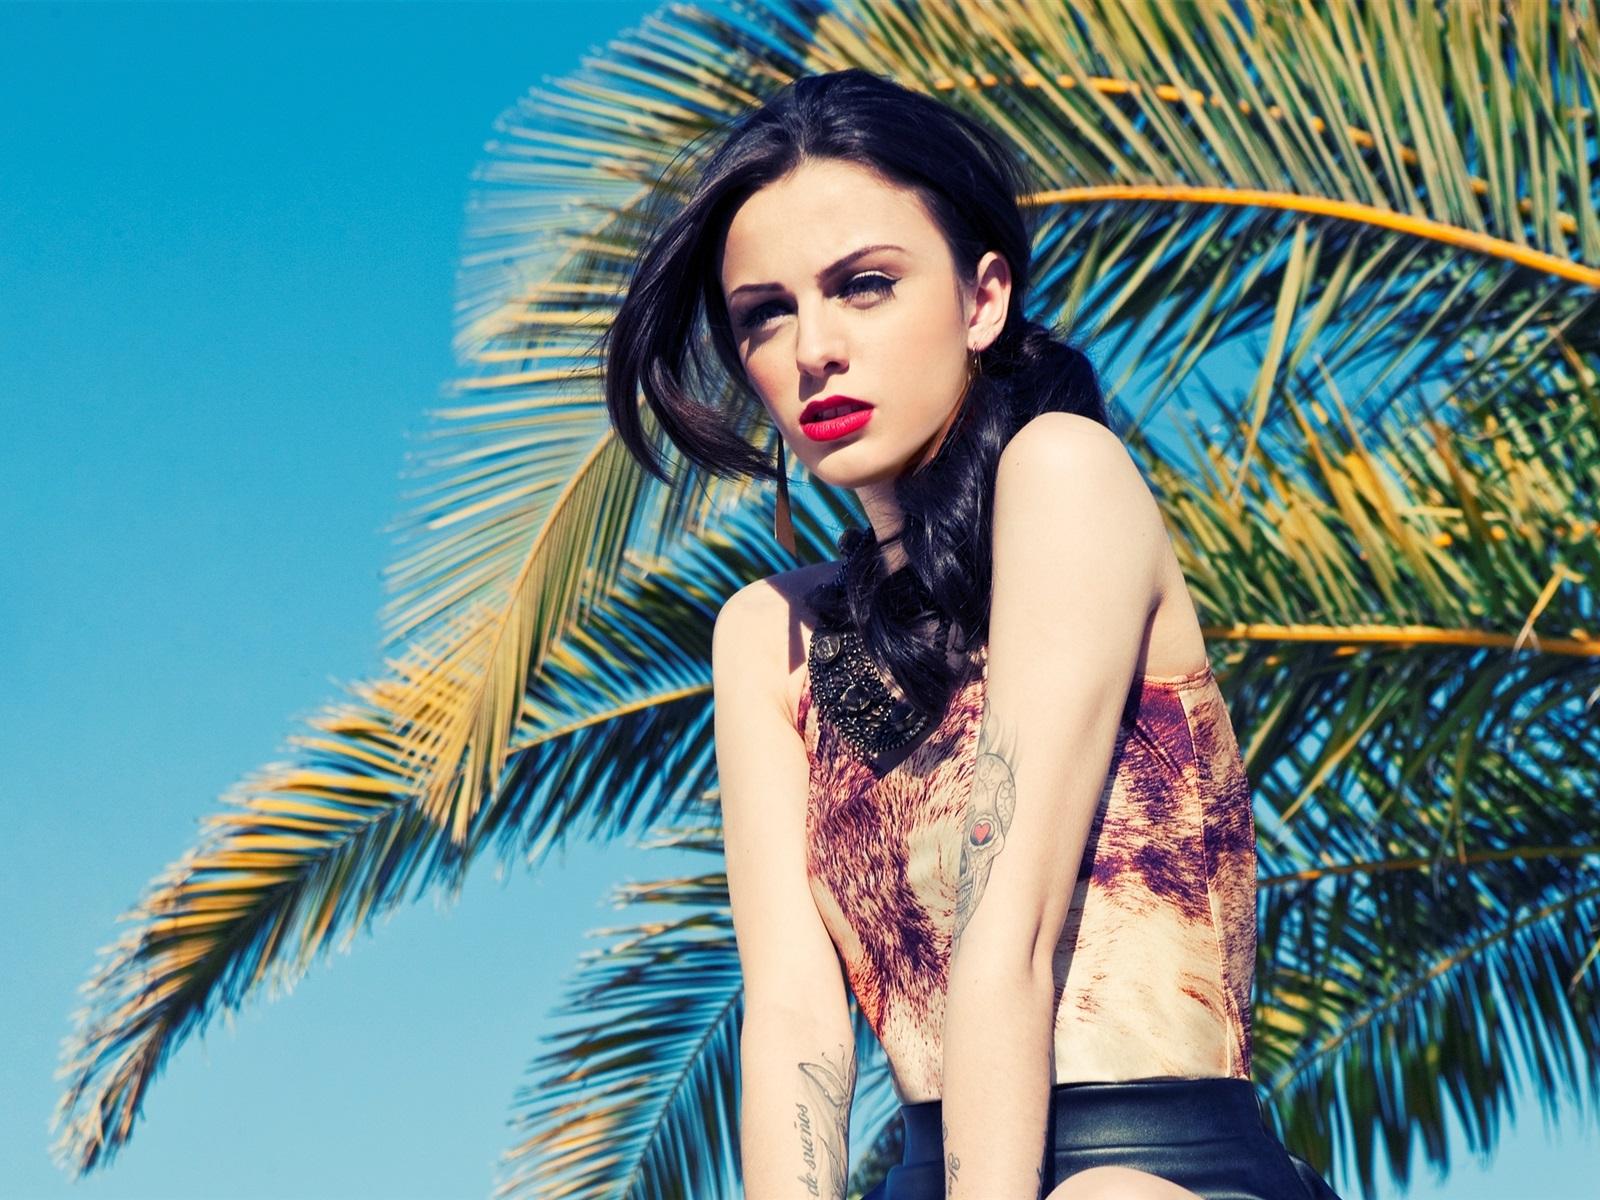 Cher Lloyd 02 Wallpaper | 1600x1200 resolution wallpaper ...